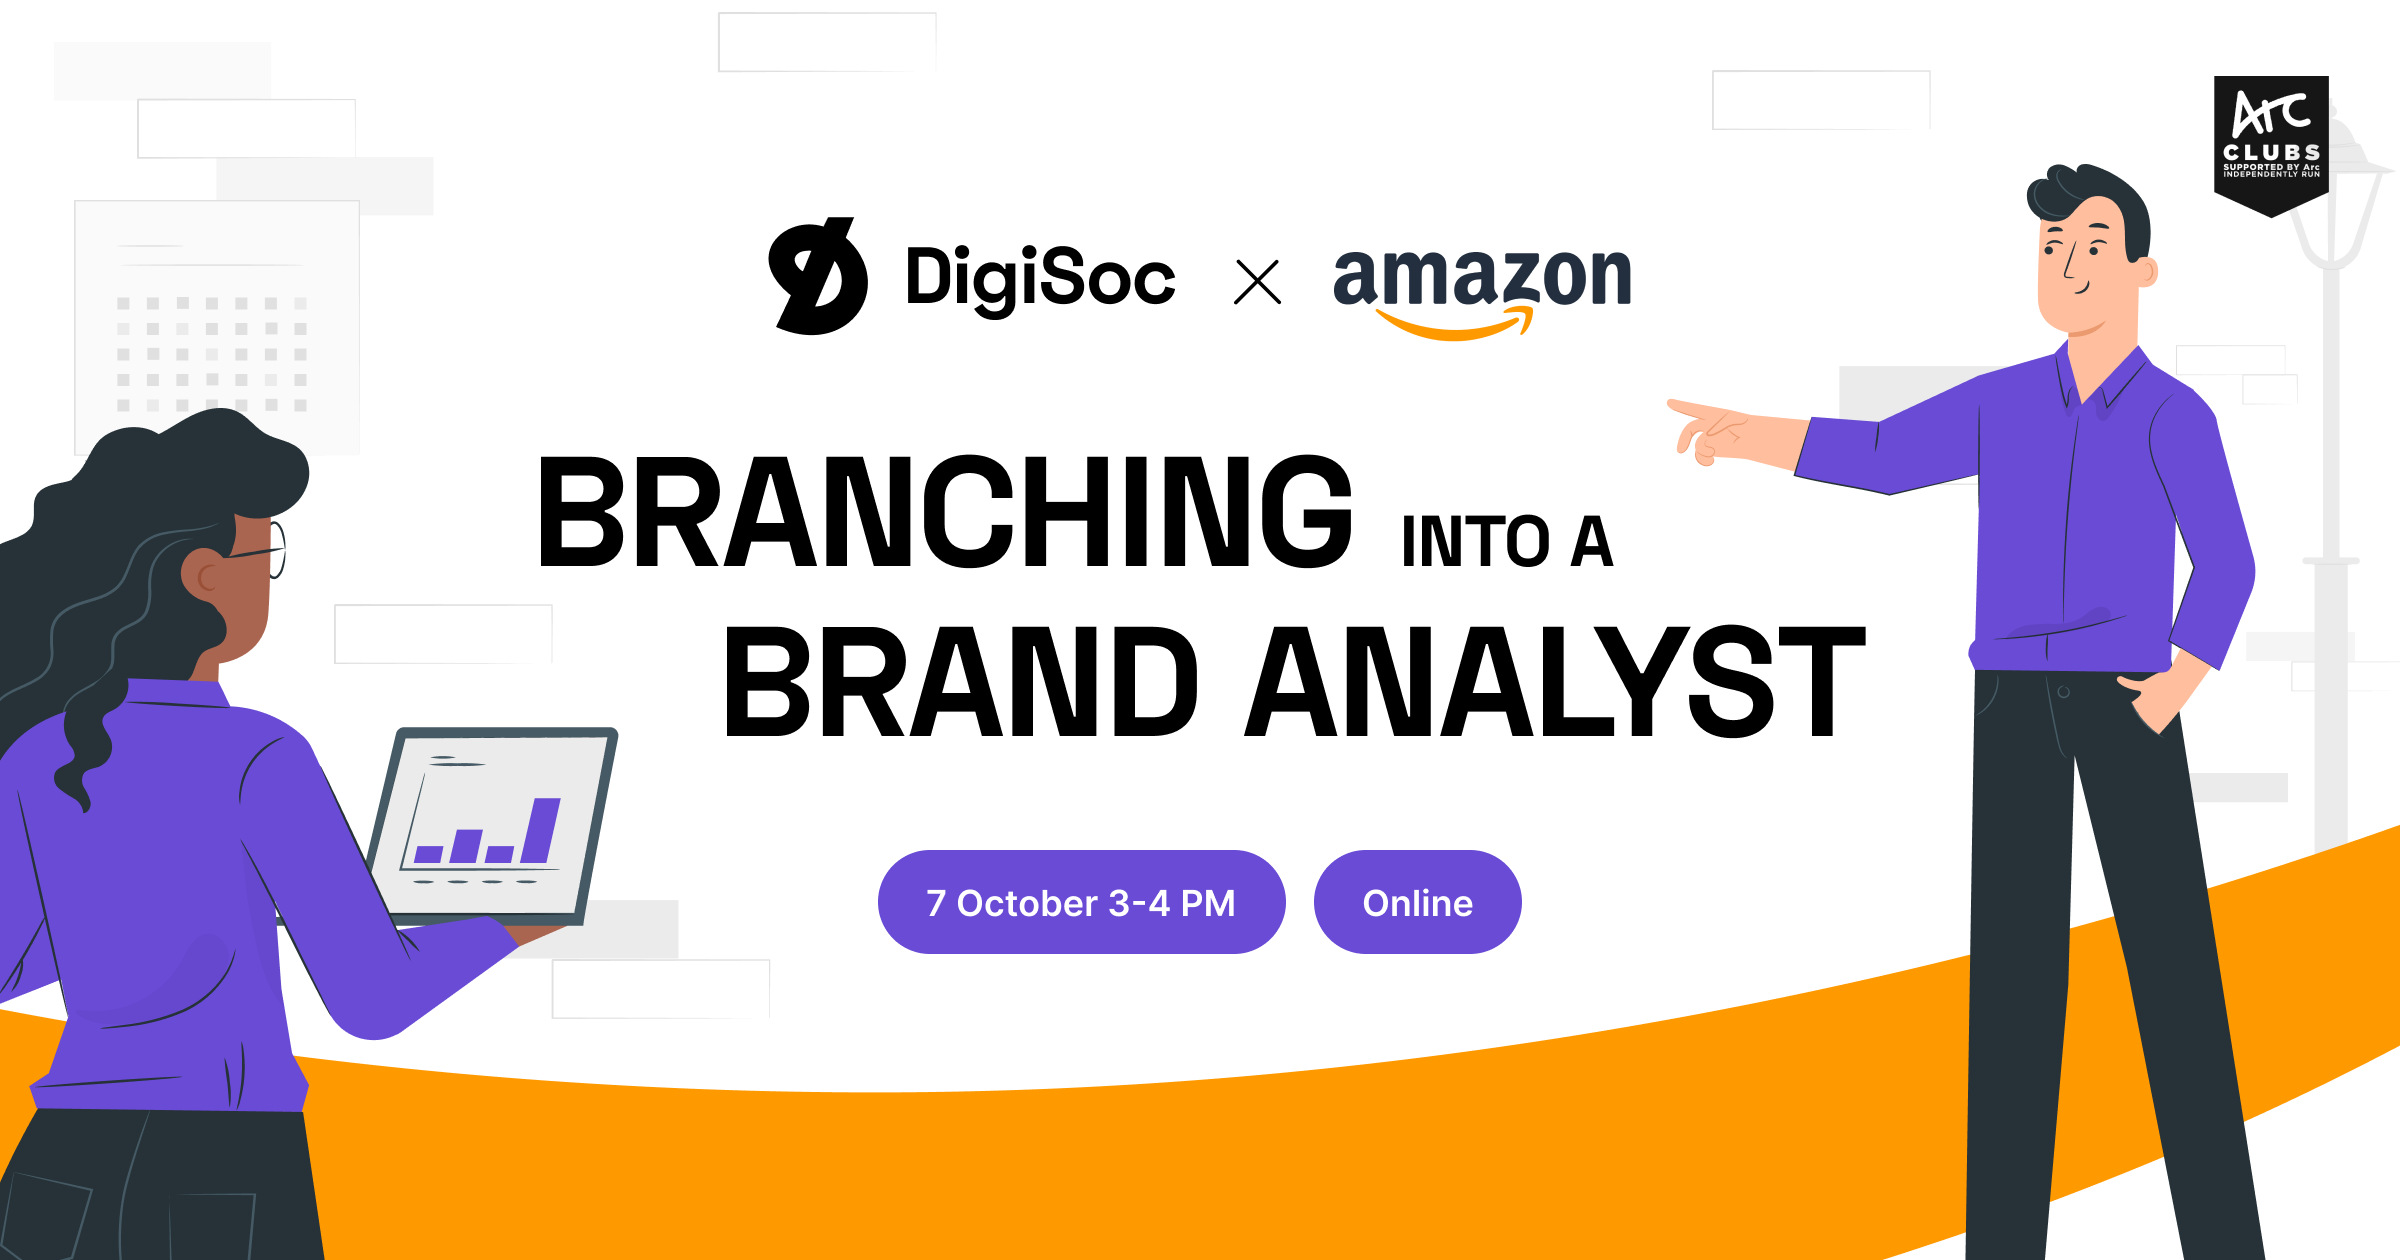 DigiSoc x Amazon: Branching into a Brand Analyst